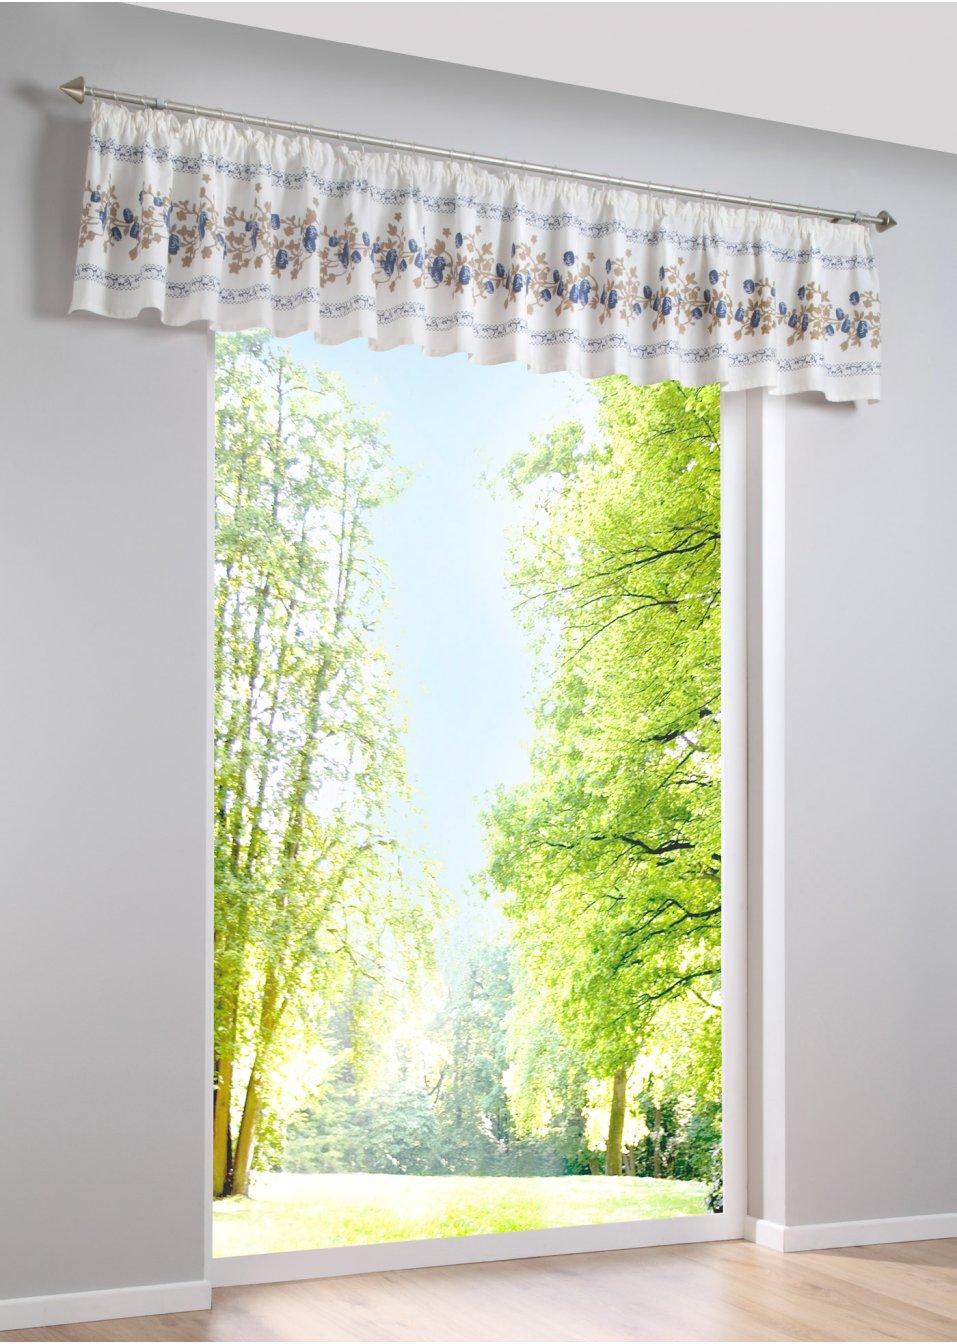 querbehang k che landhausstil k che modern rot toom unterschrank 80 cm breit 180 mit keramik. Black Bedroom Furniture Sets. Home Design Ideas